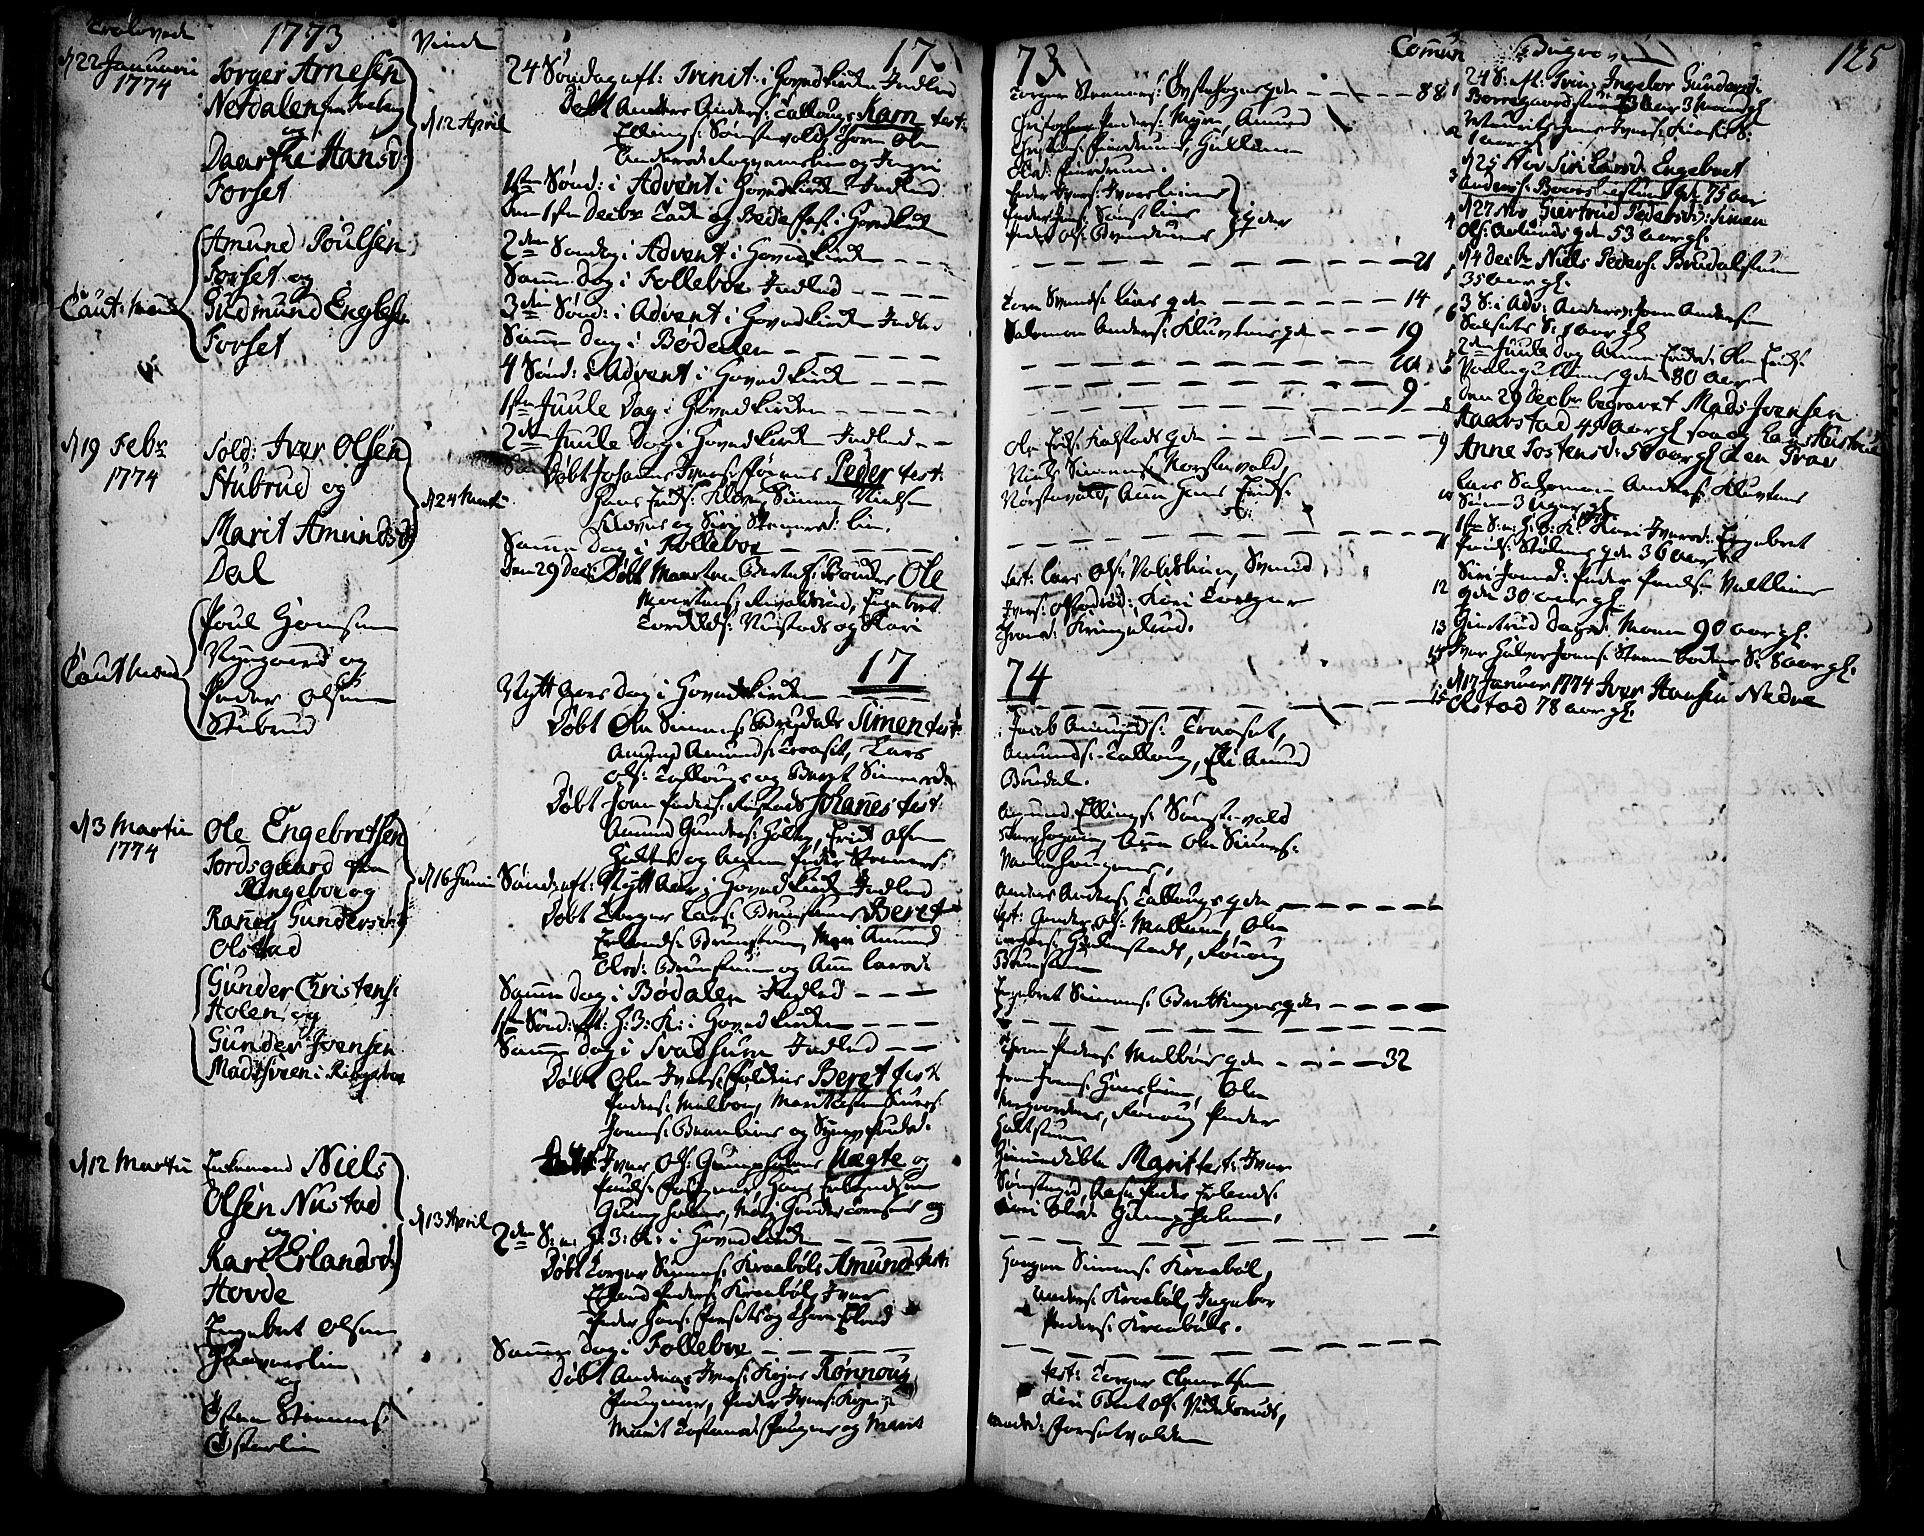 SAH, Gausdal prestekontor, Ministerialbok nr. 3, 1758-1809, s. 125